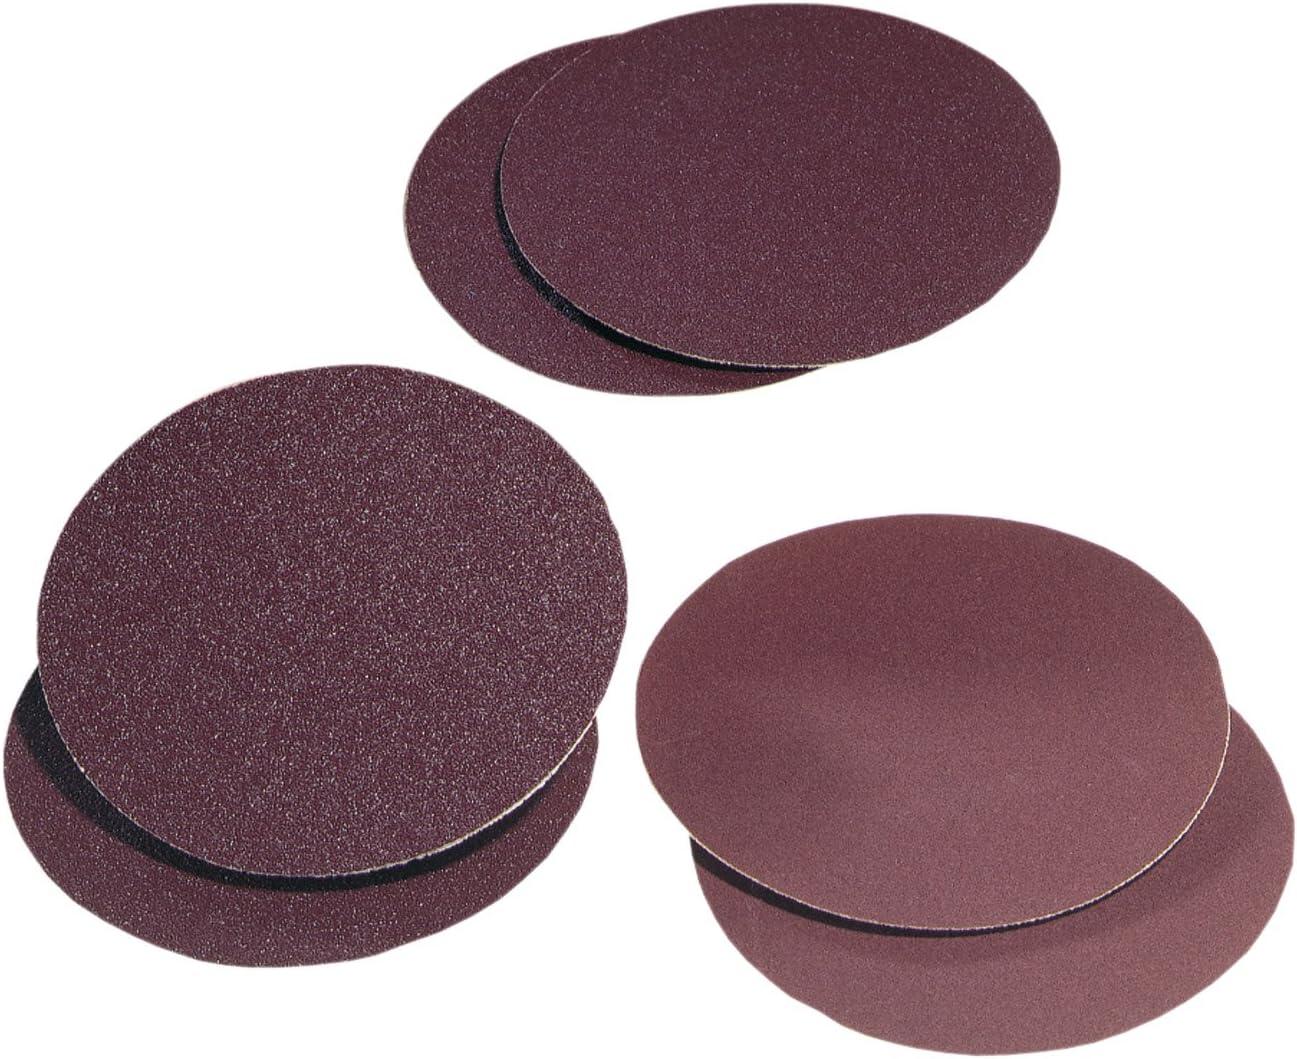 Delta 8 inch 80 Grit Aluminum Oxide Sanding Adhesive Disc 2 Pack Sandpaper Discs